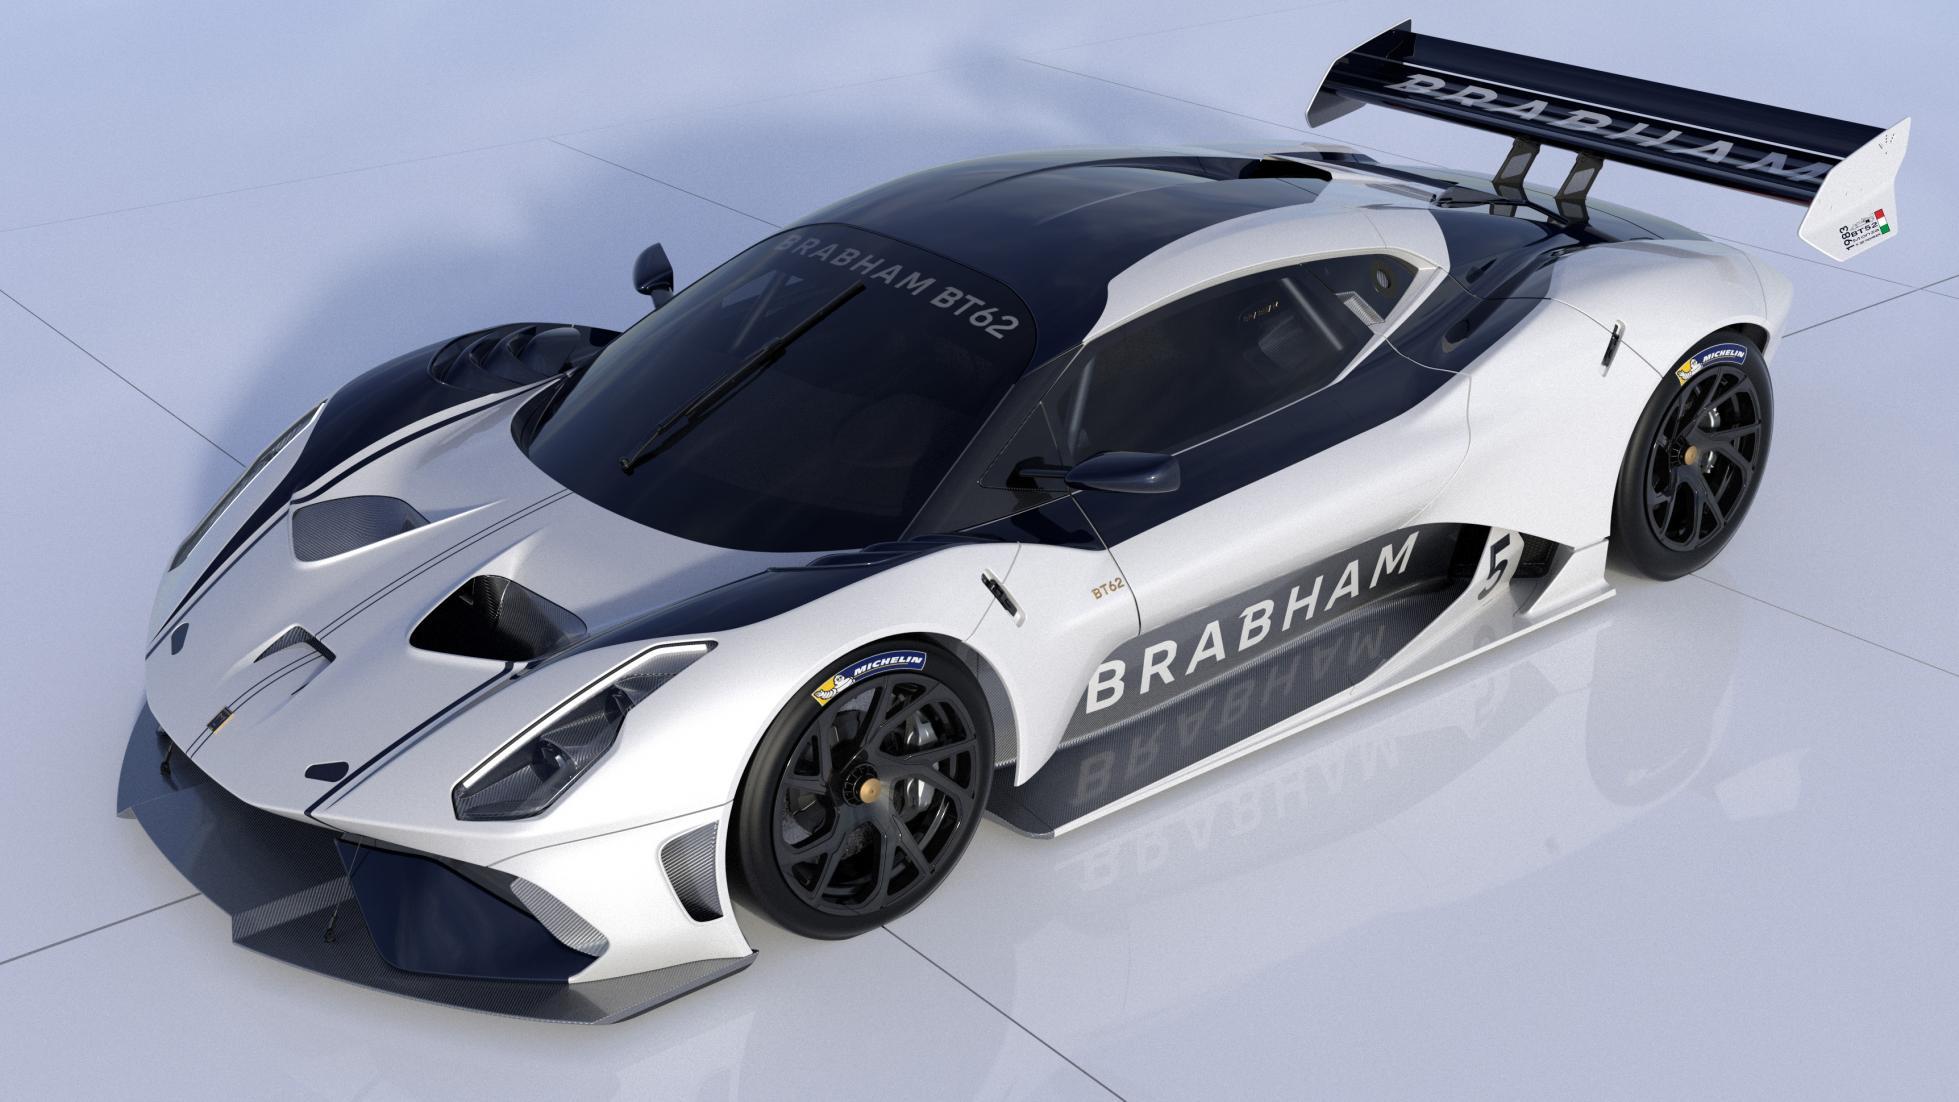 Brabham BT62 0003